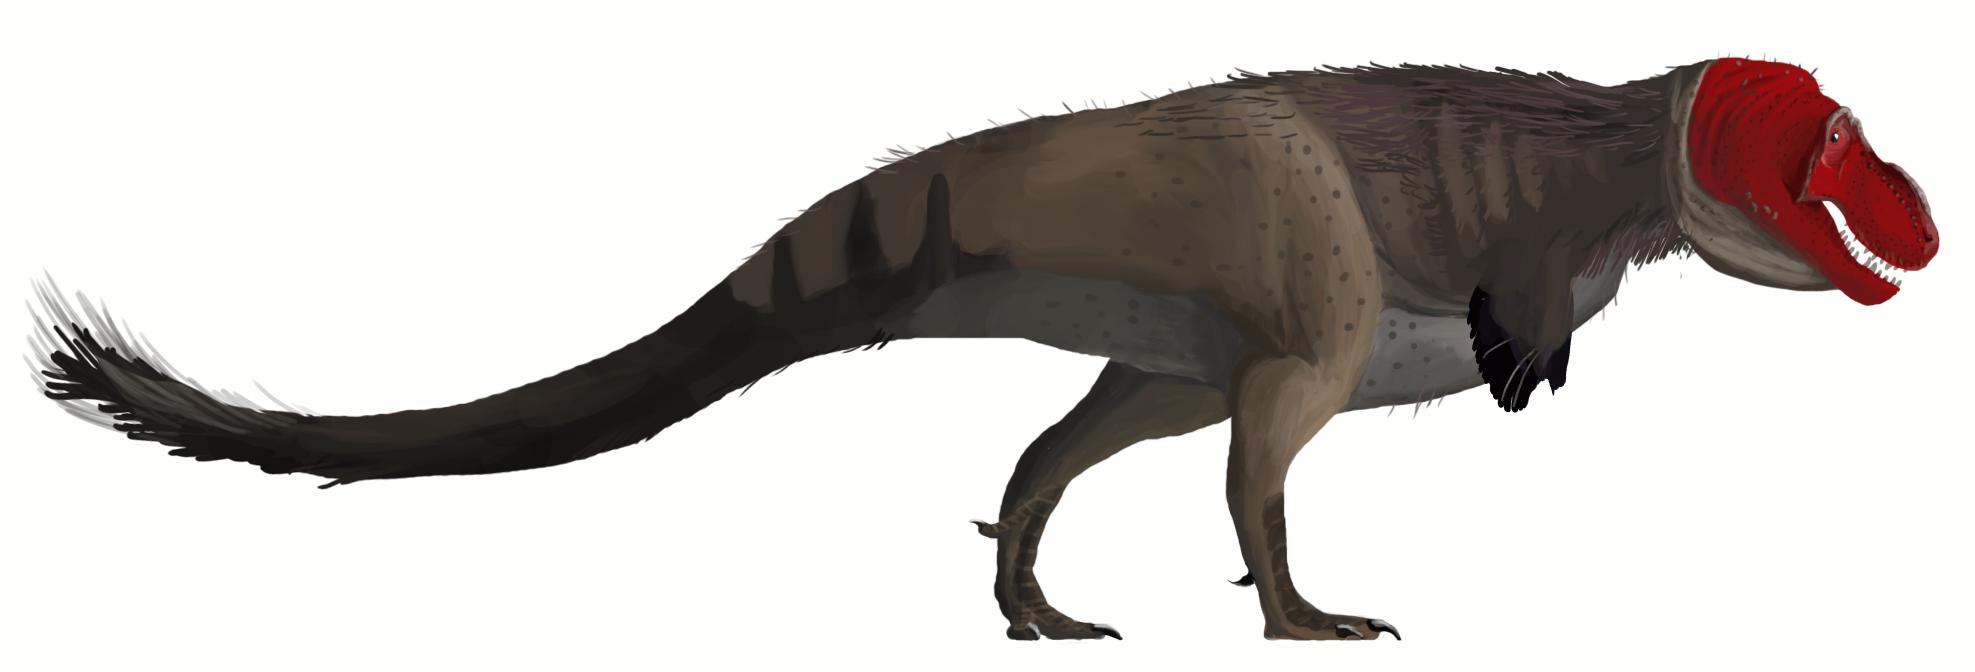 Tyrannosaurus_rex_mmartyniuk.png (1975×672) - Basé sur le spécimen AMNH 5027. Dinosauria, Saurischia, Theropoda, Tetanurae, Carnosauria, Tyrannosauroidea, Tyrannosauridae. Auteur : Matt Martyniuk, 2013.